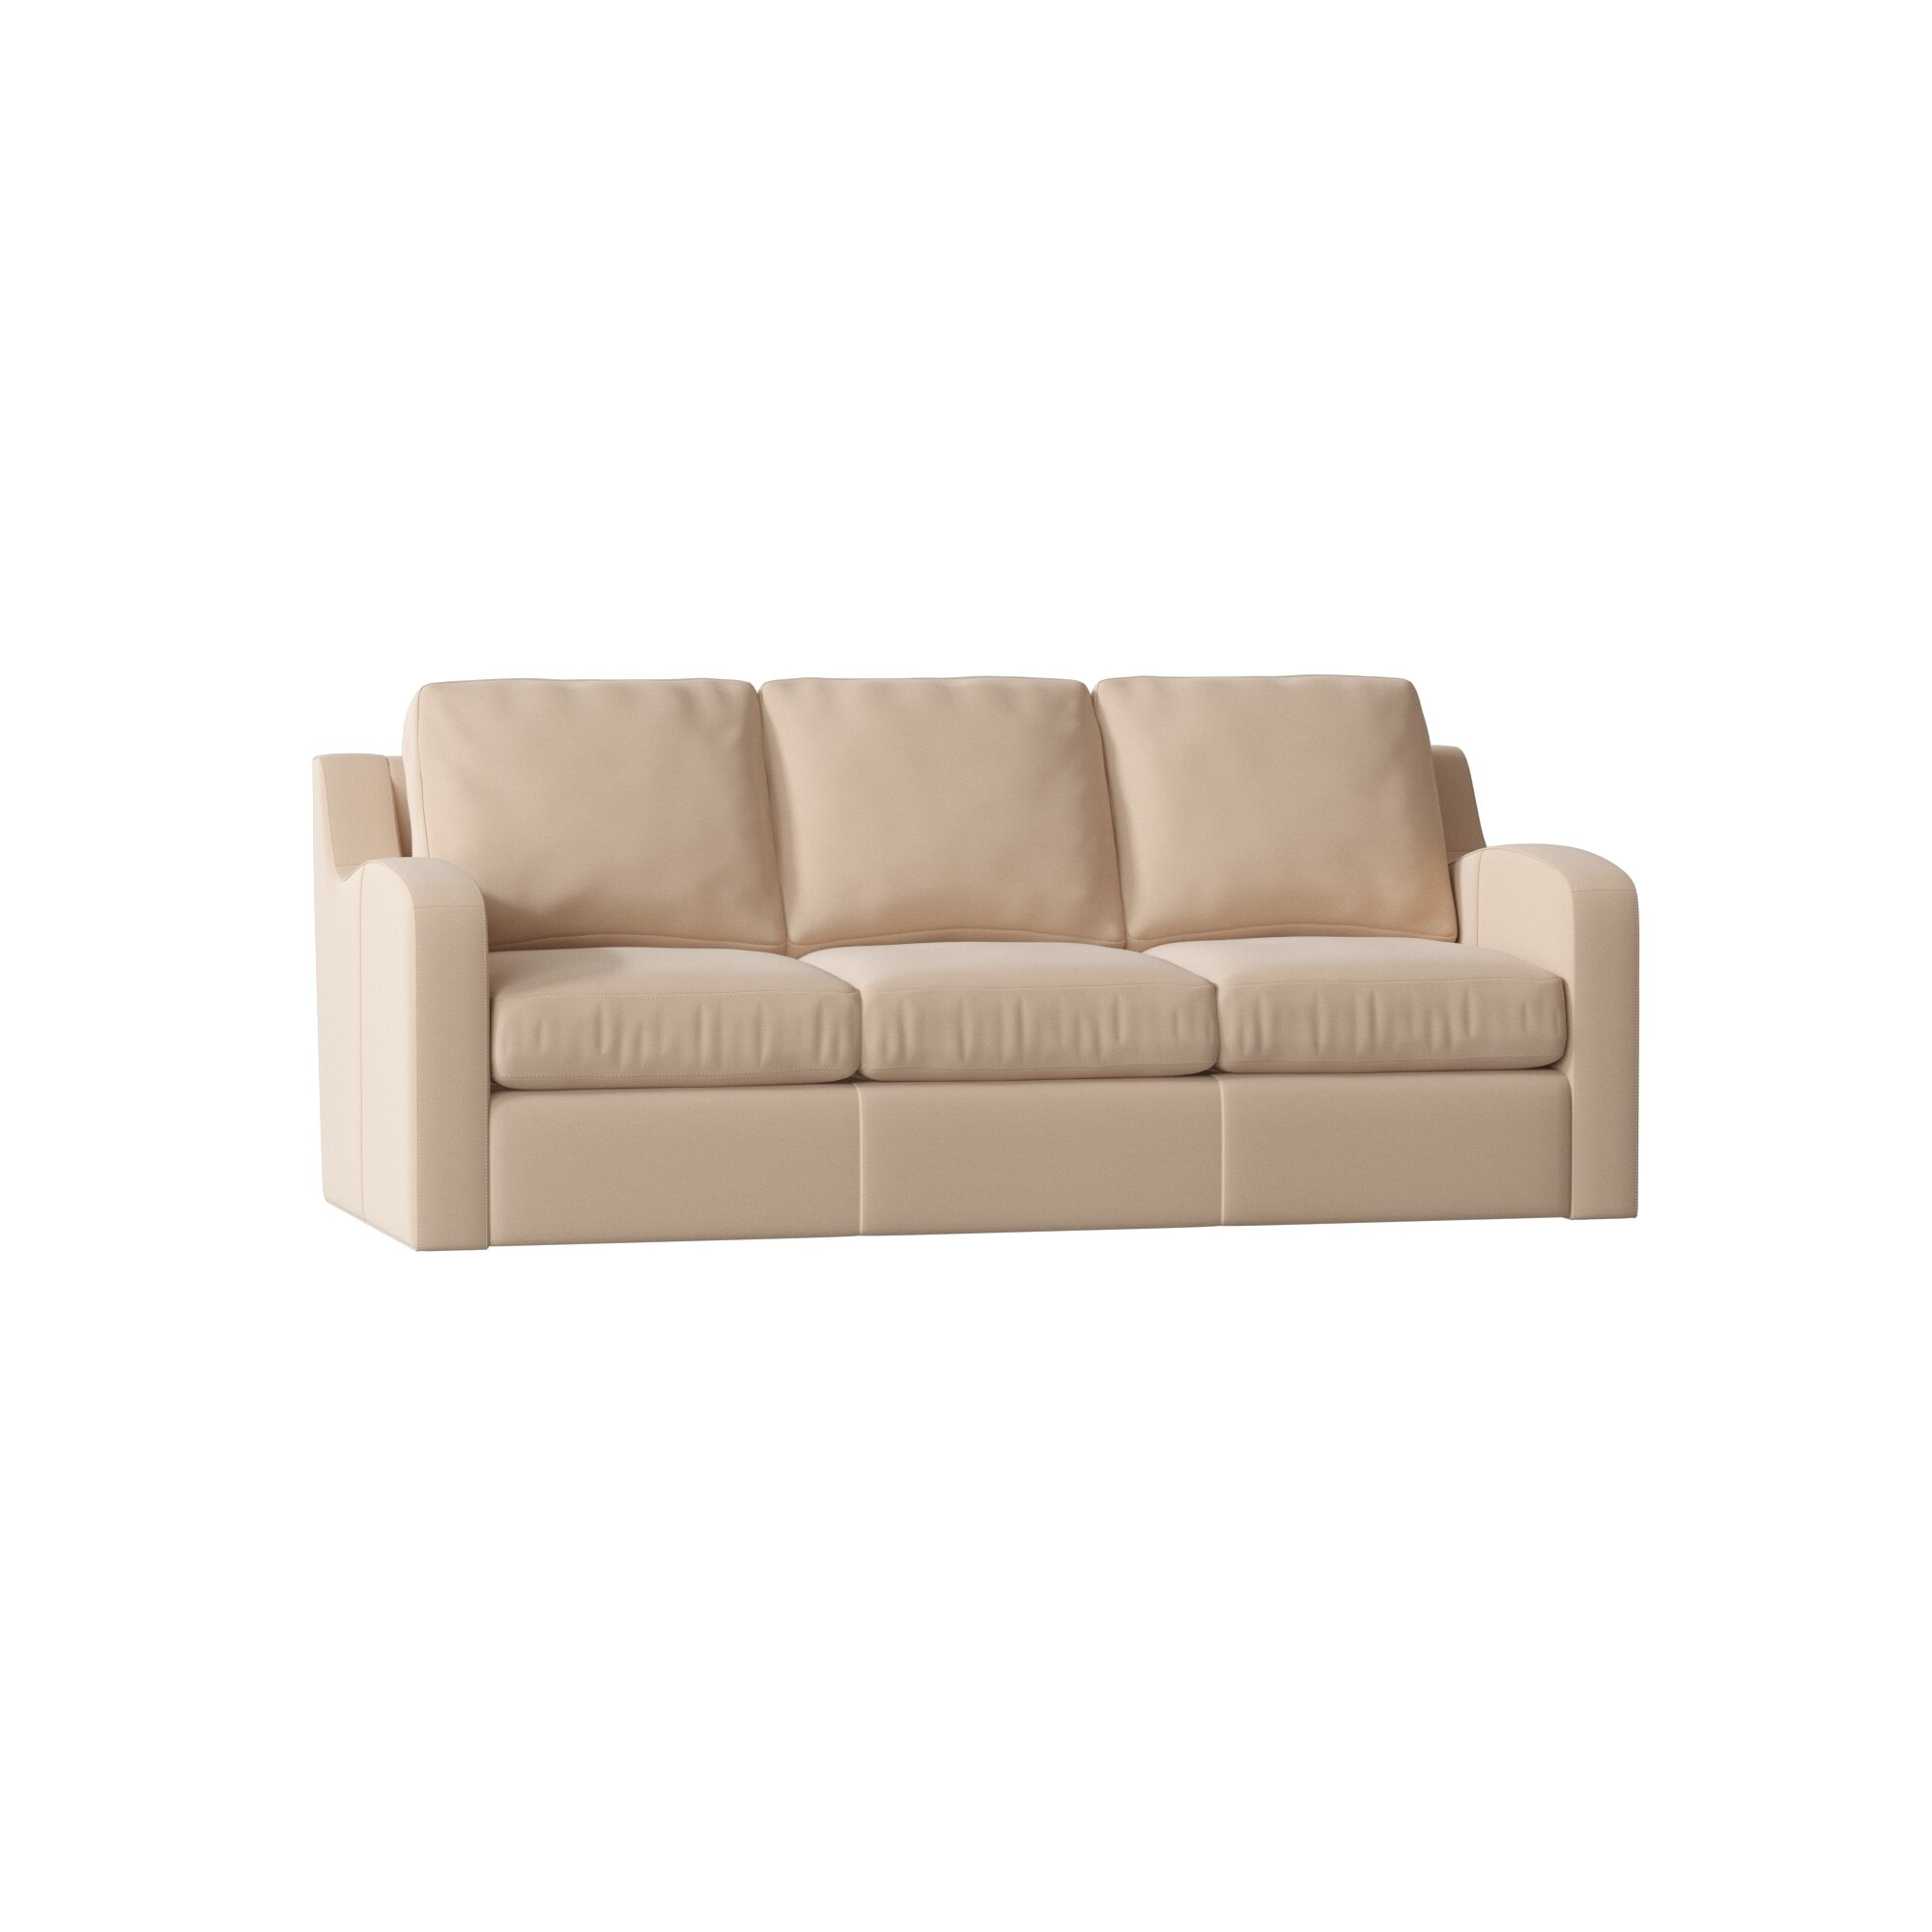 Pleasing Chelsea Deco Sofa Evergreenethics Interior Chair Design Evergreenethicsorg